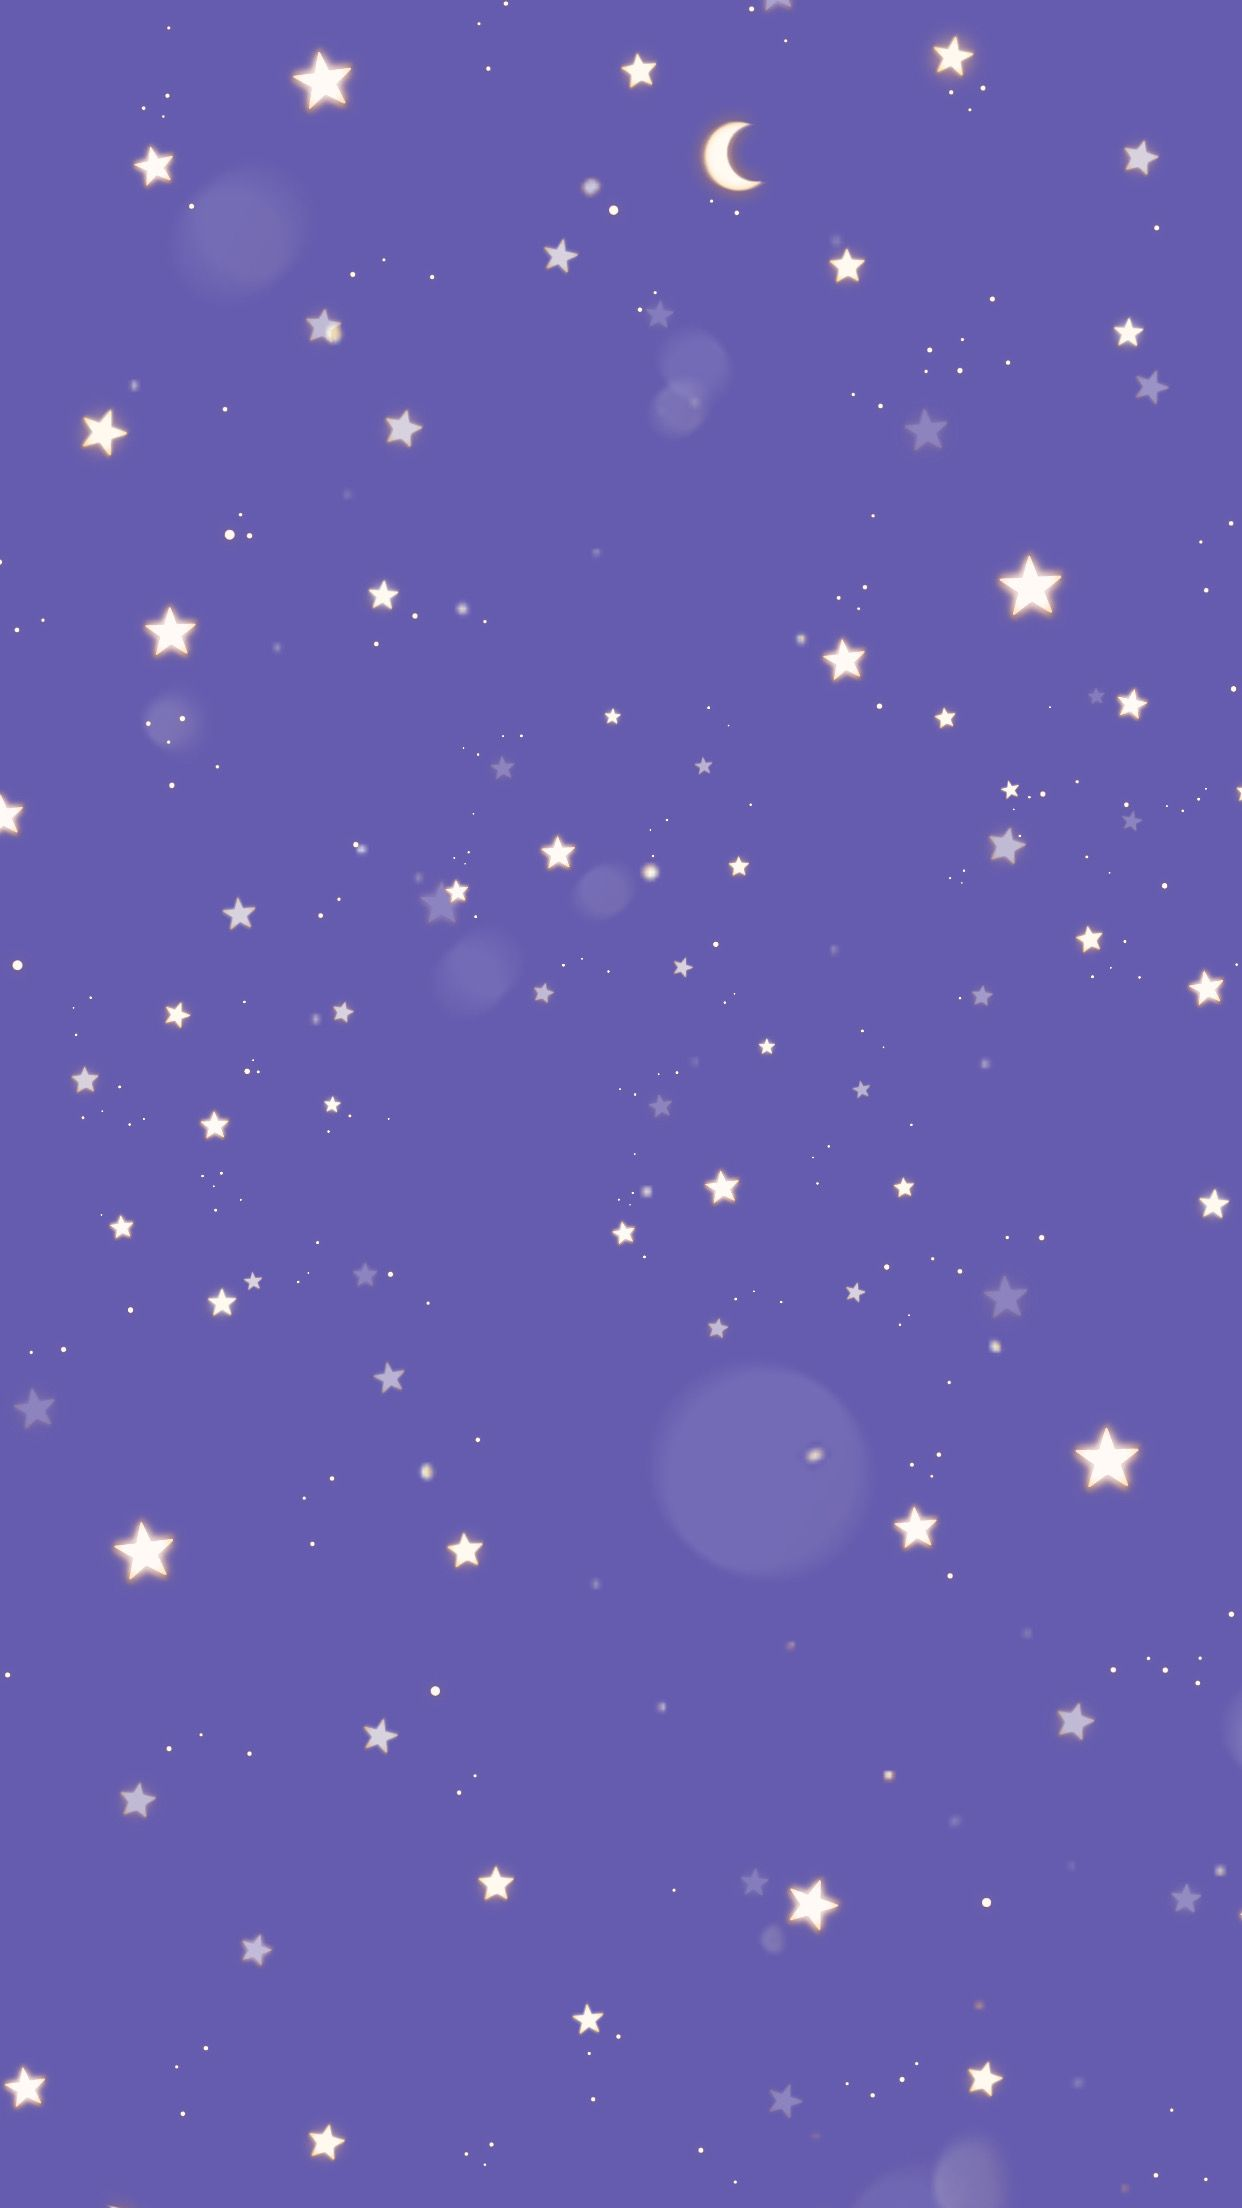 Cute Purple Stars Wallpaper Star Wallpaper Hamster Wallpaper Purple Wallpaper